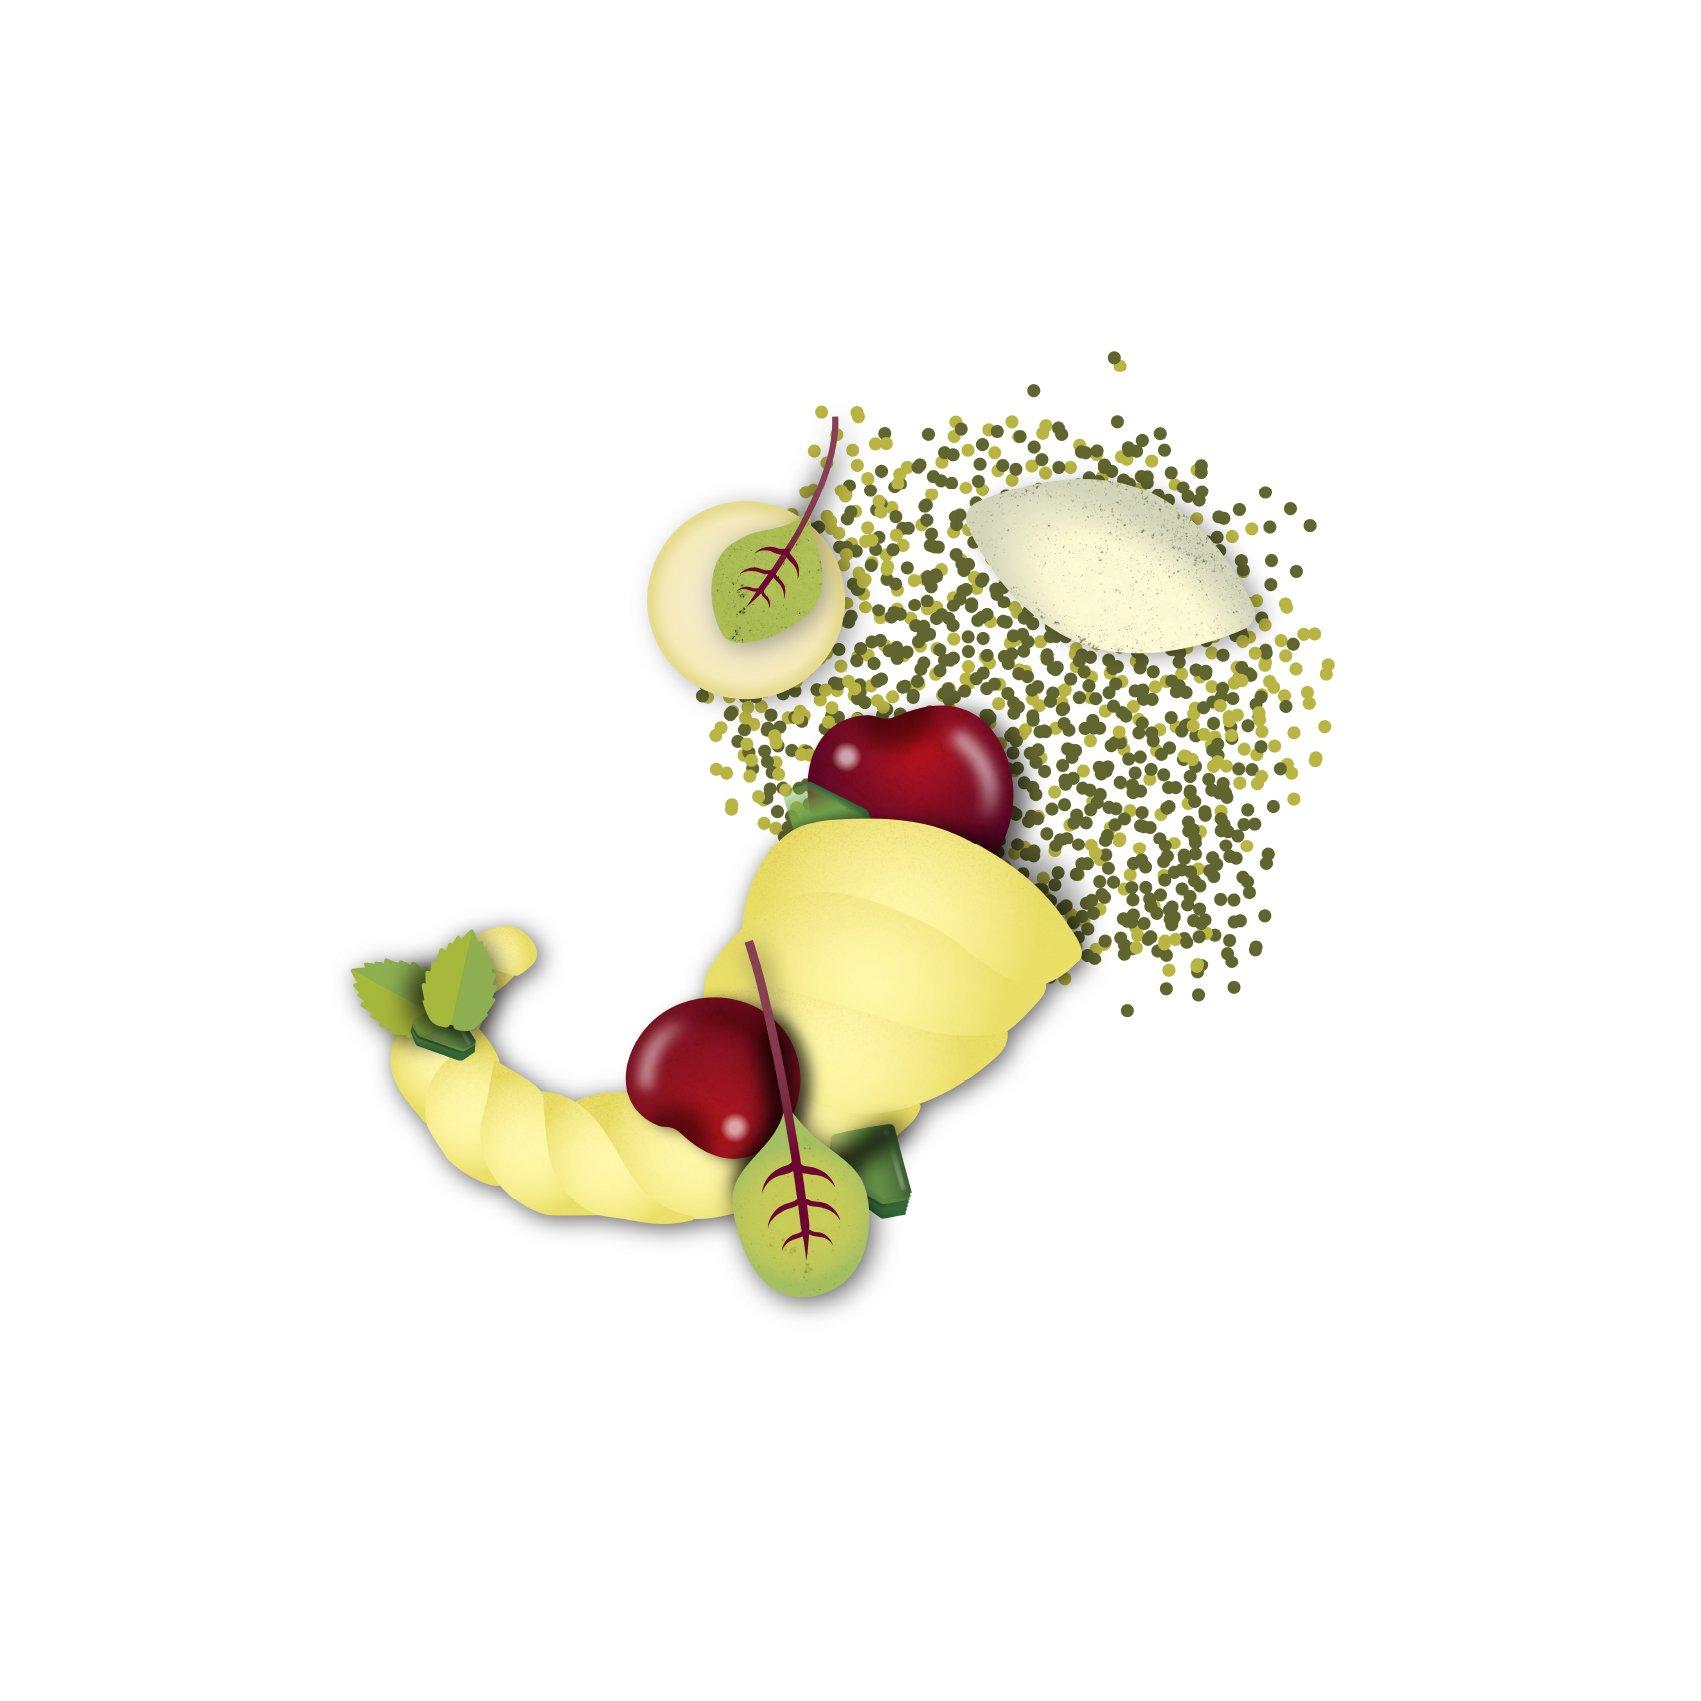 Sublime food design ricette in cibografica 34